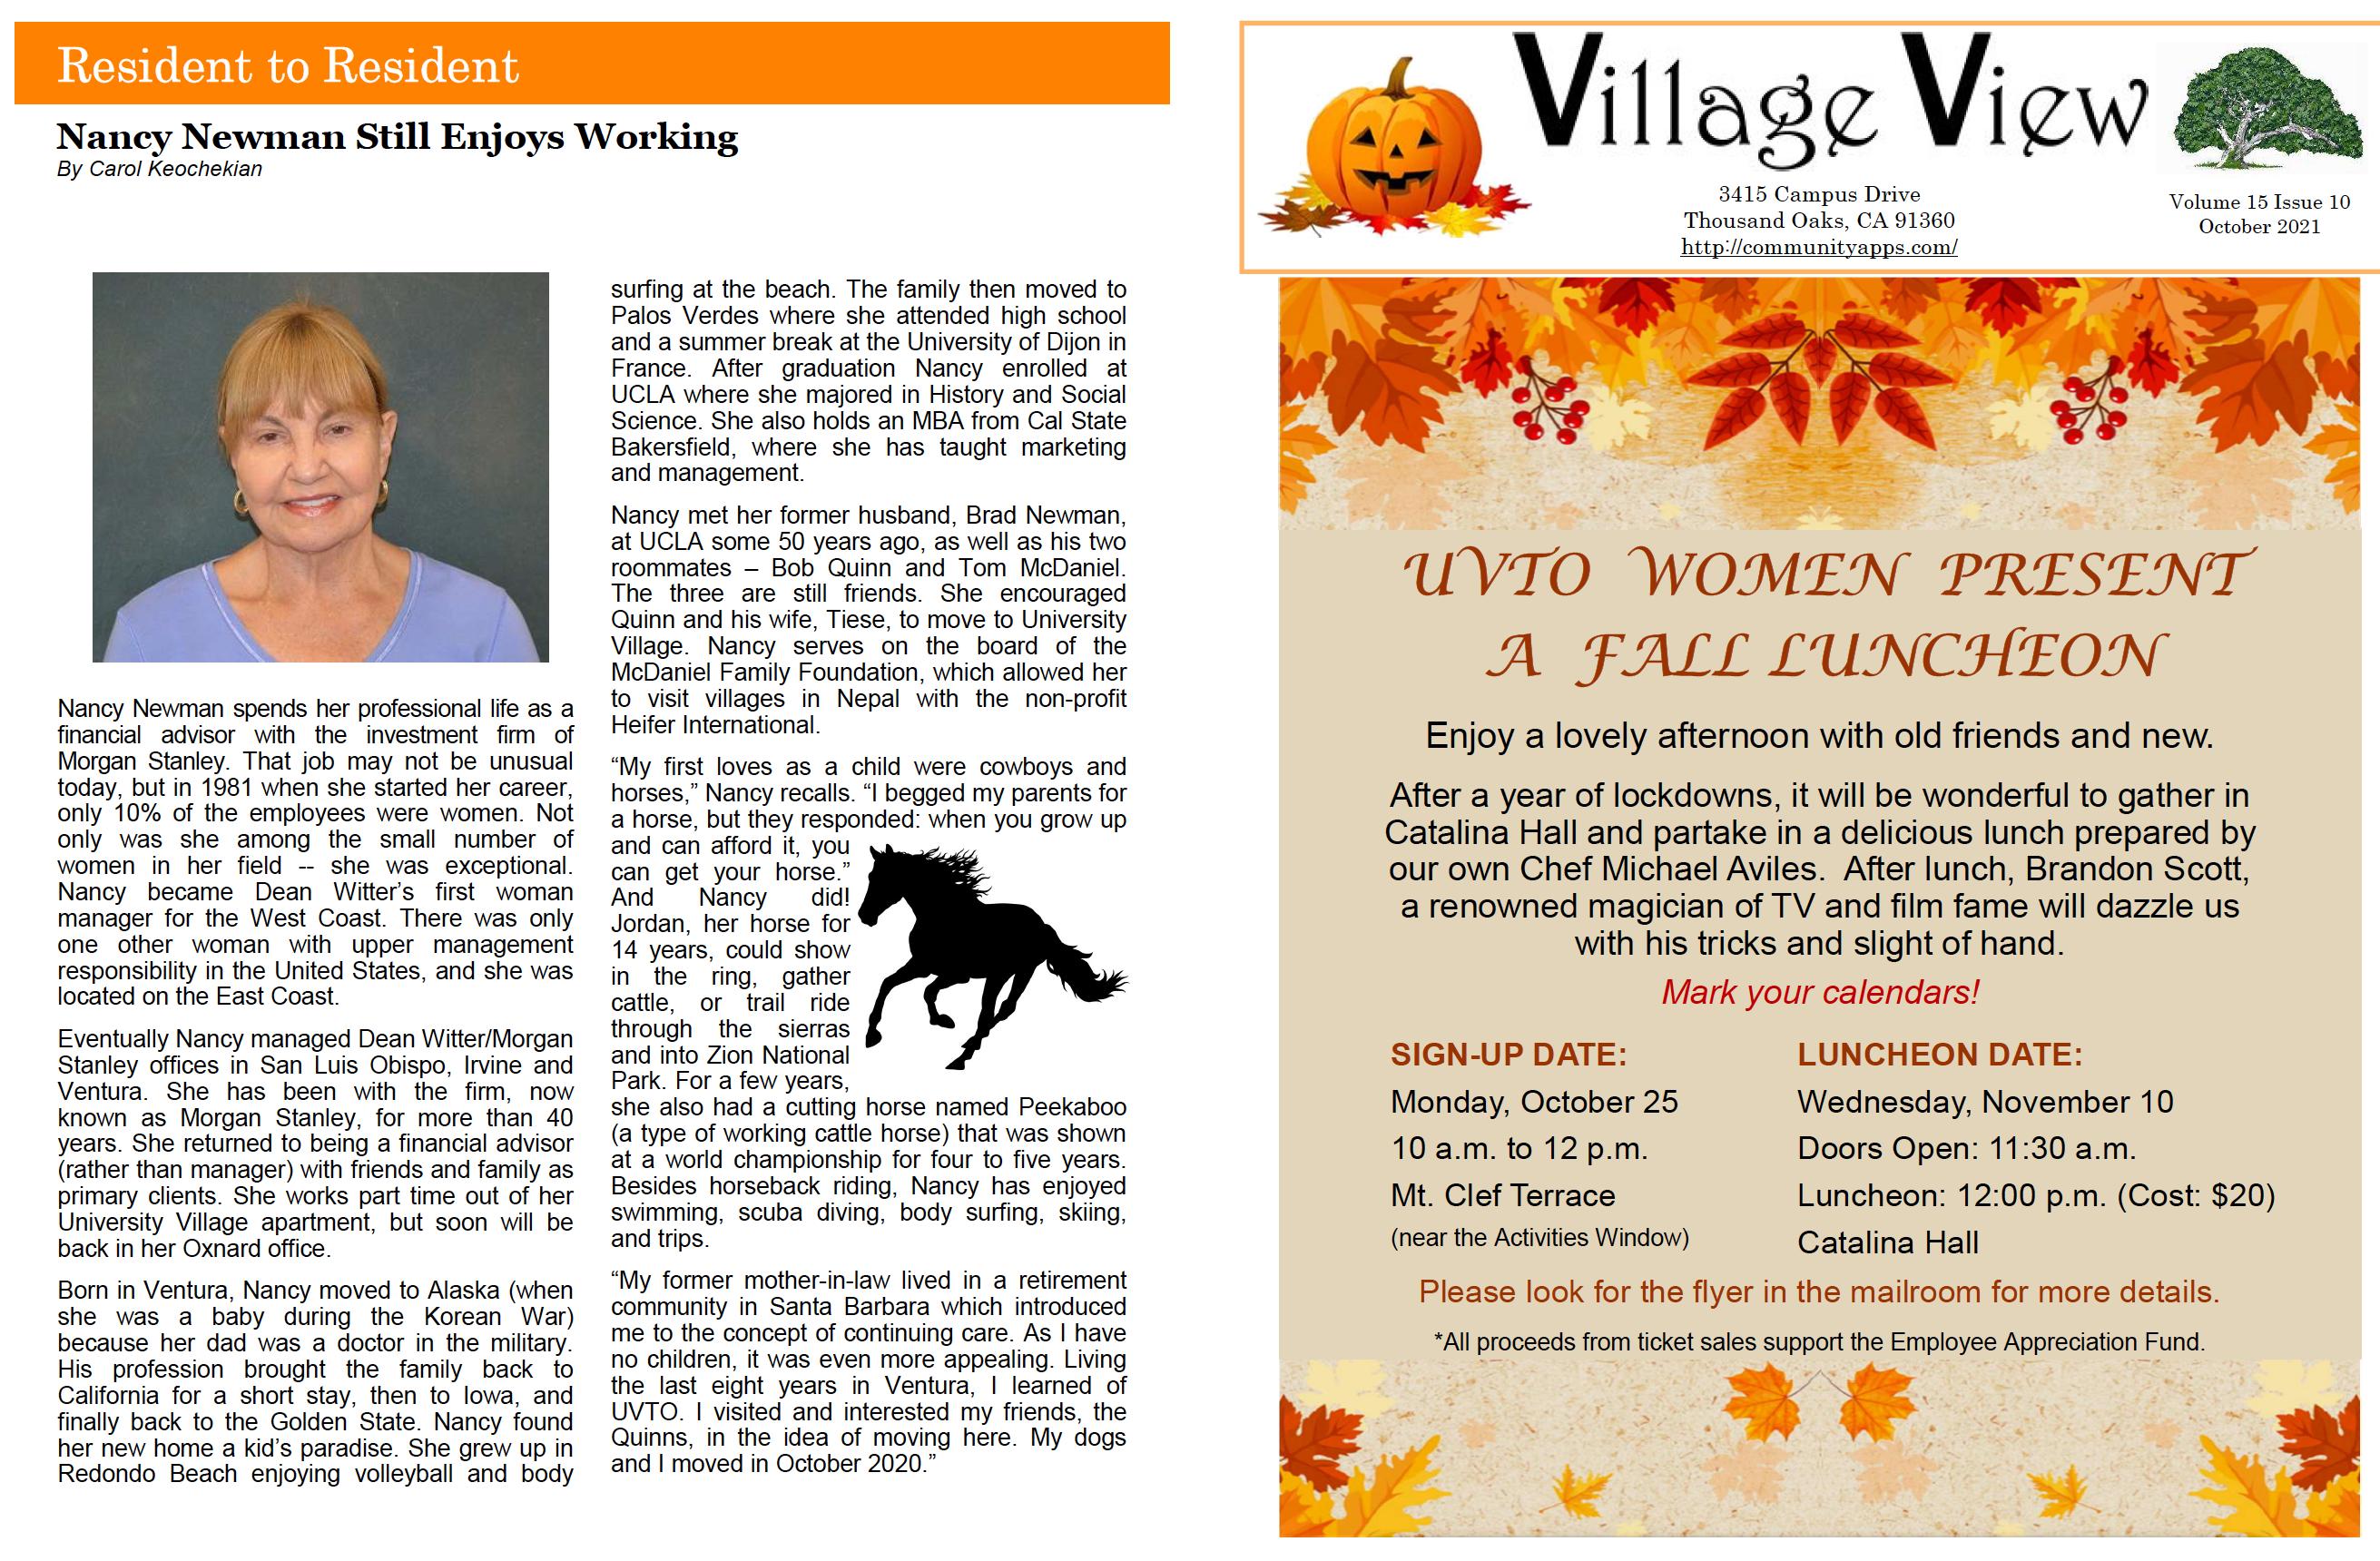 Village View October 2021